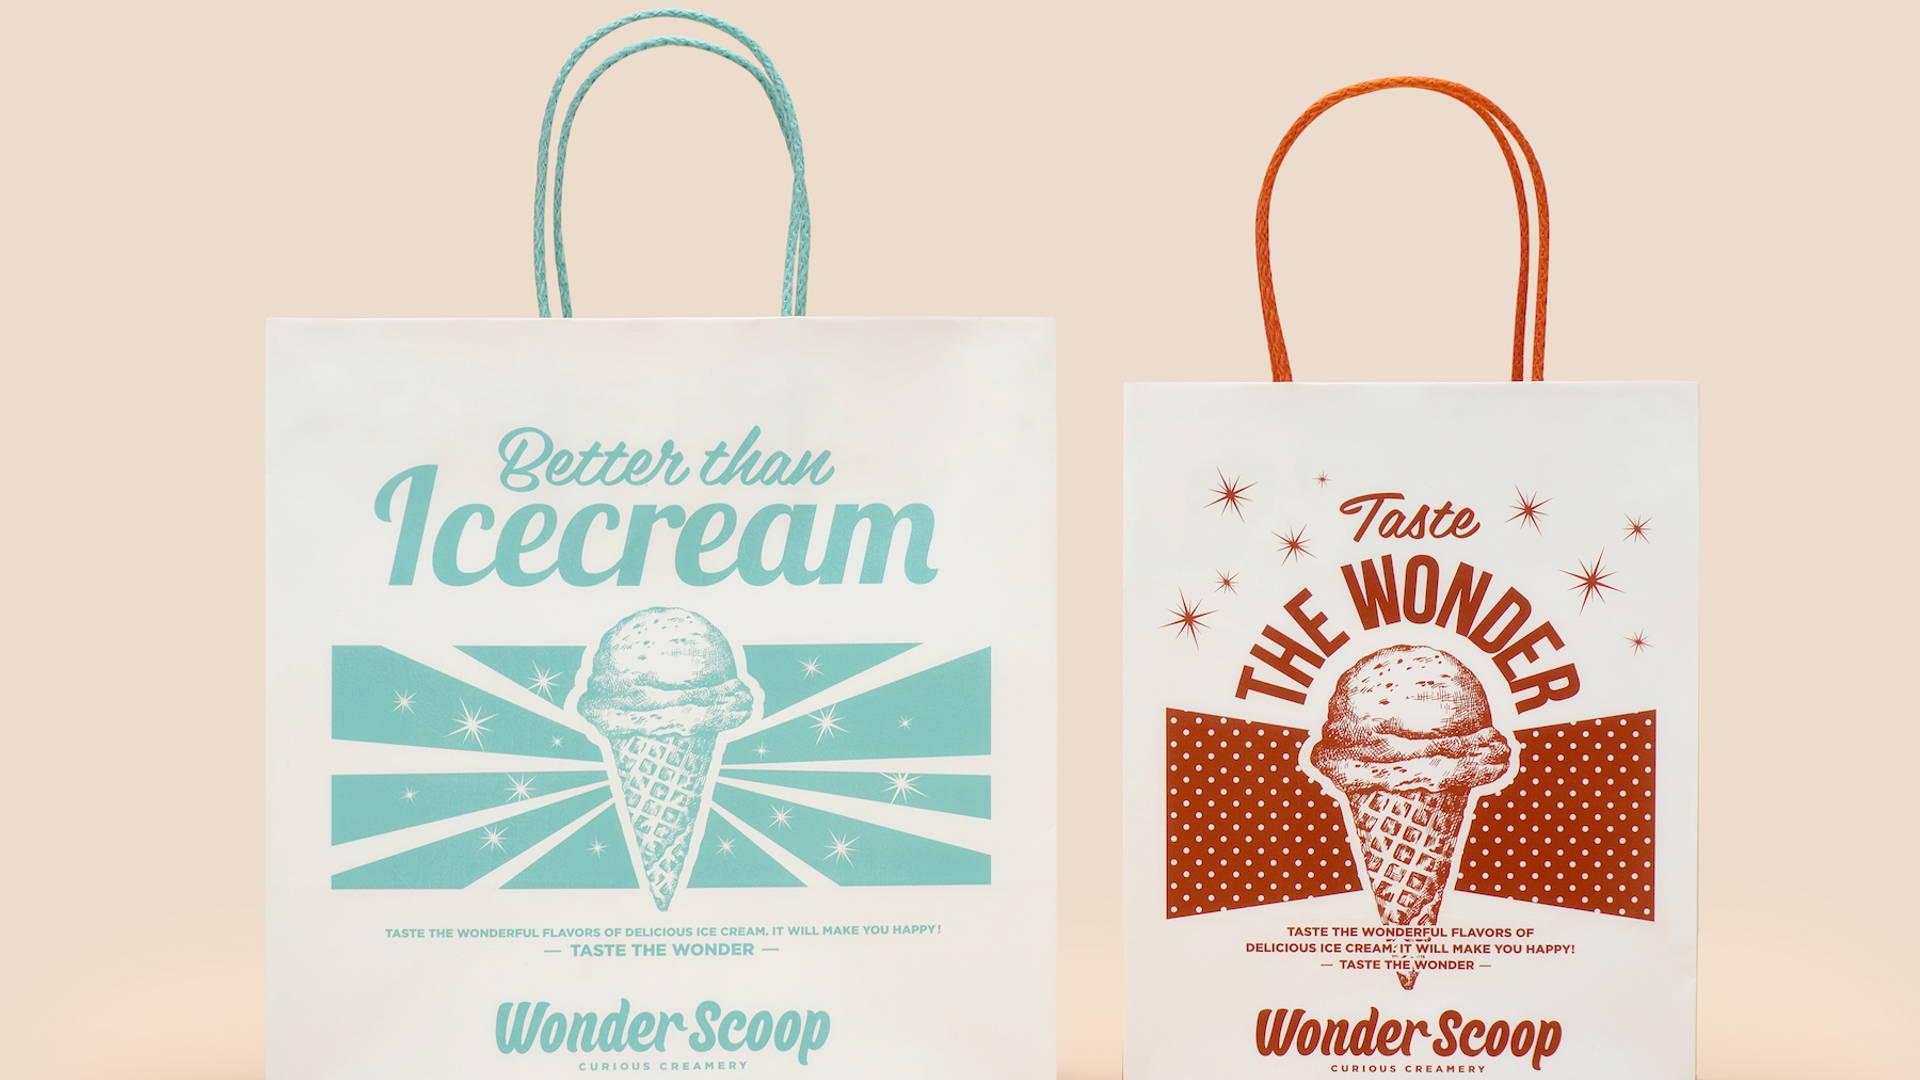 498ca1c8ed3e93 Vintage Inspiration + Sassy Phrases   One Adorable Ice Cream Brand ...